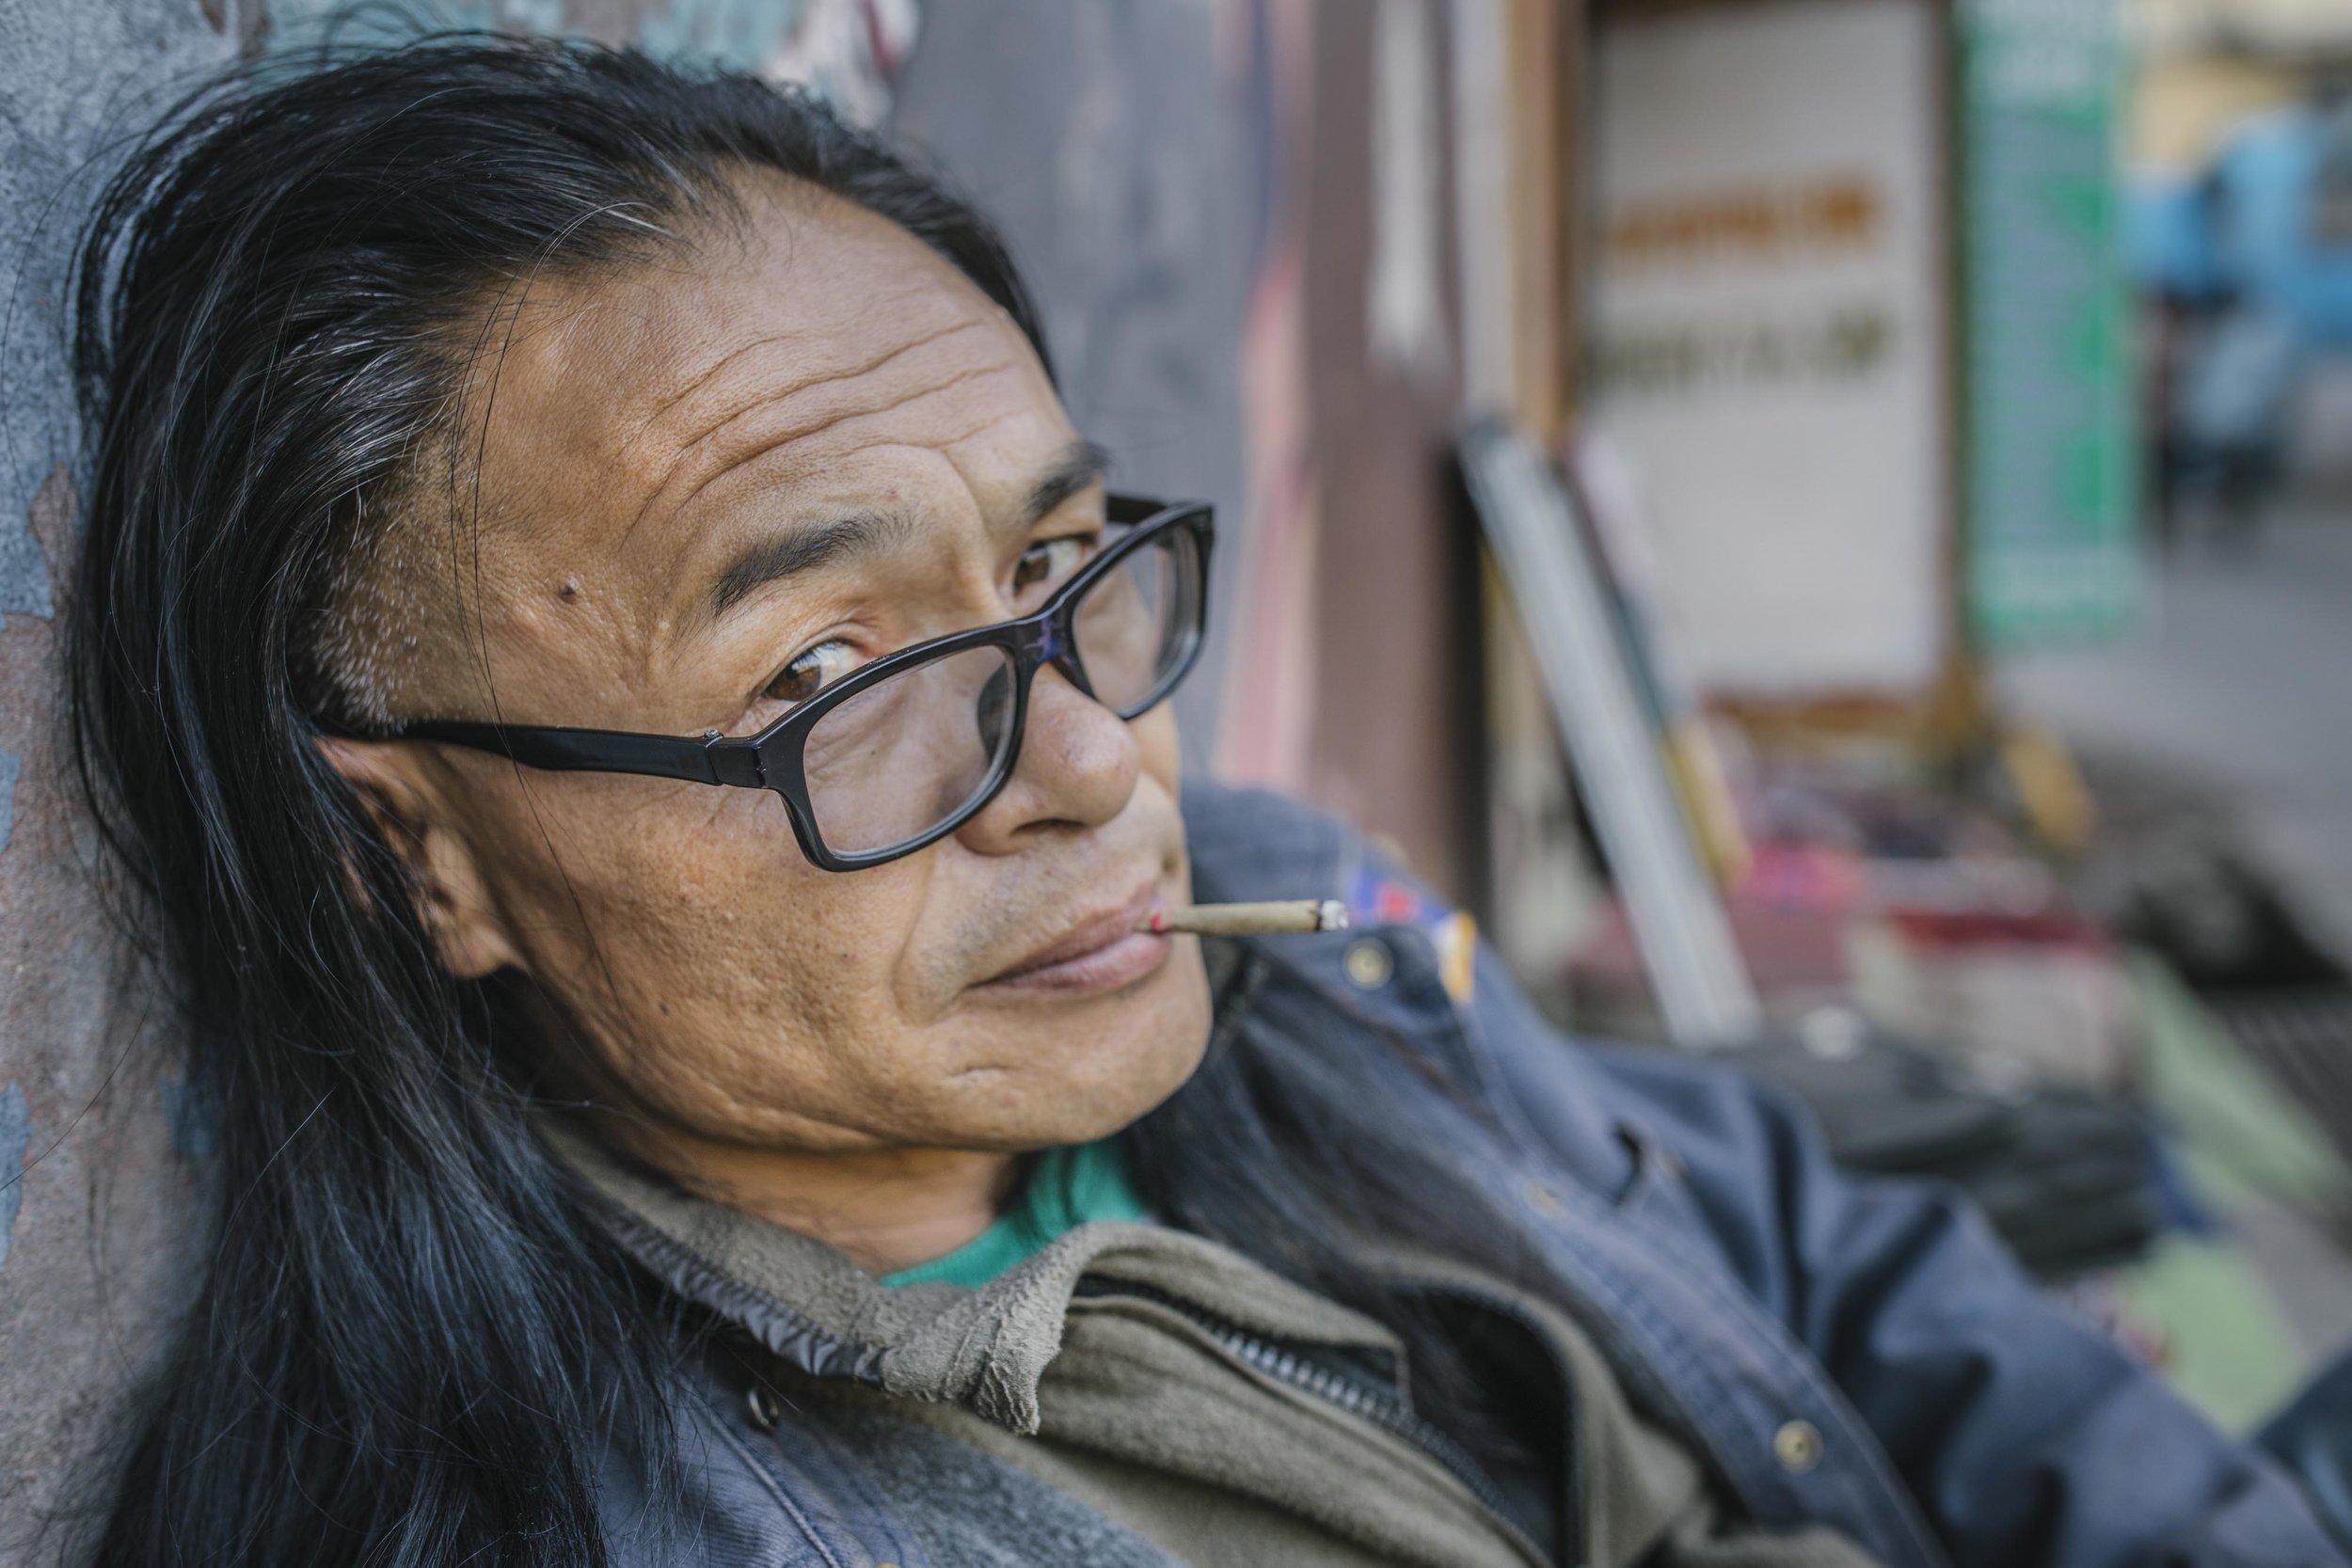 Mesib Norbu, former monk, writer and part of Free Tibet movement outside the poetry tea shop he runs in Mcleod Ganj, Himachal Pradesh, India.